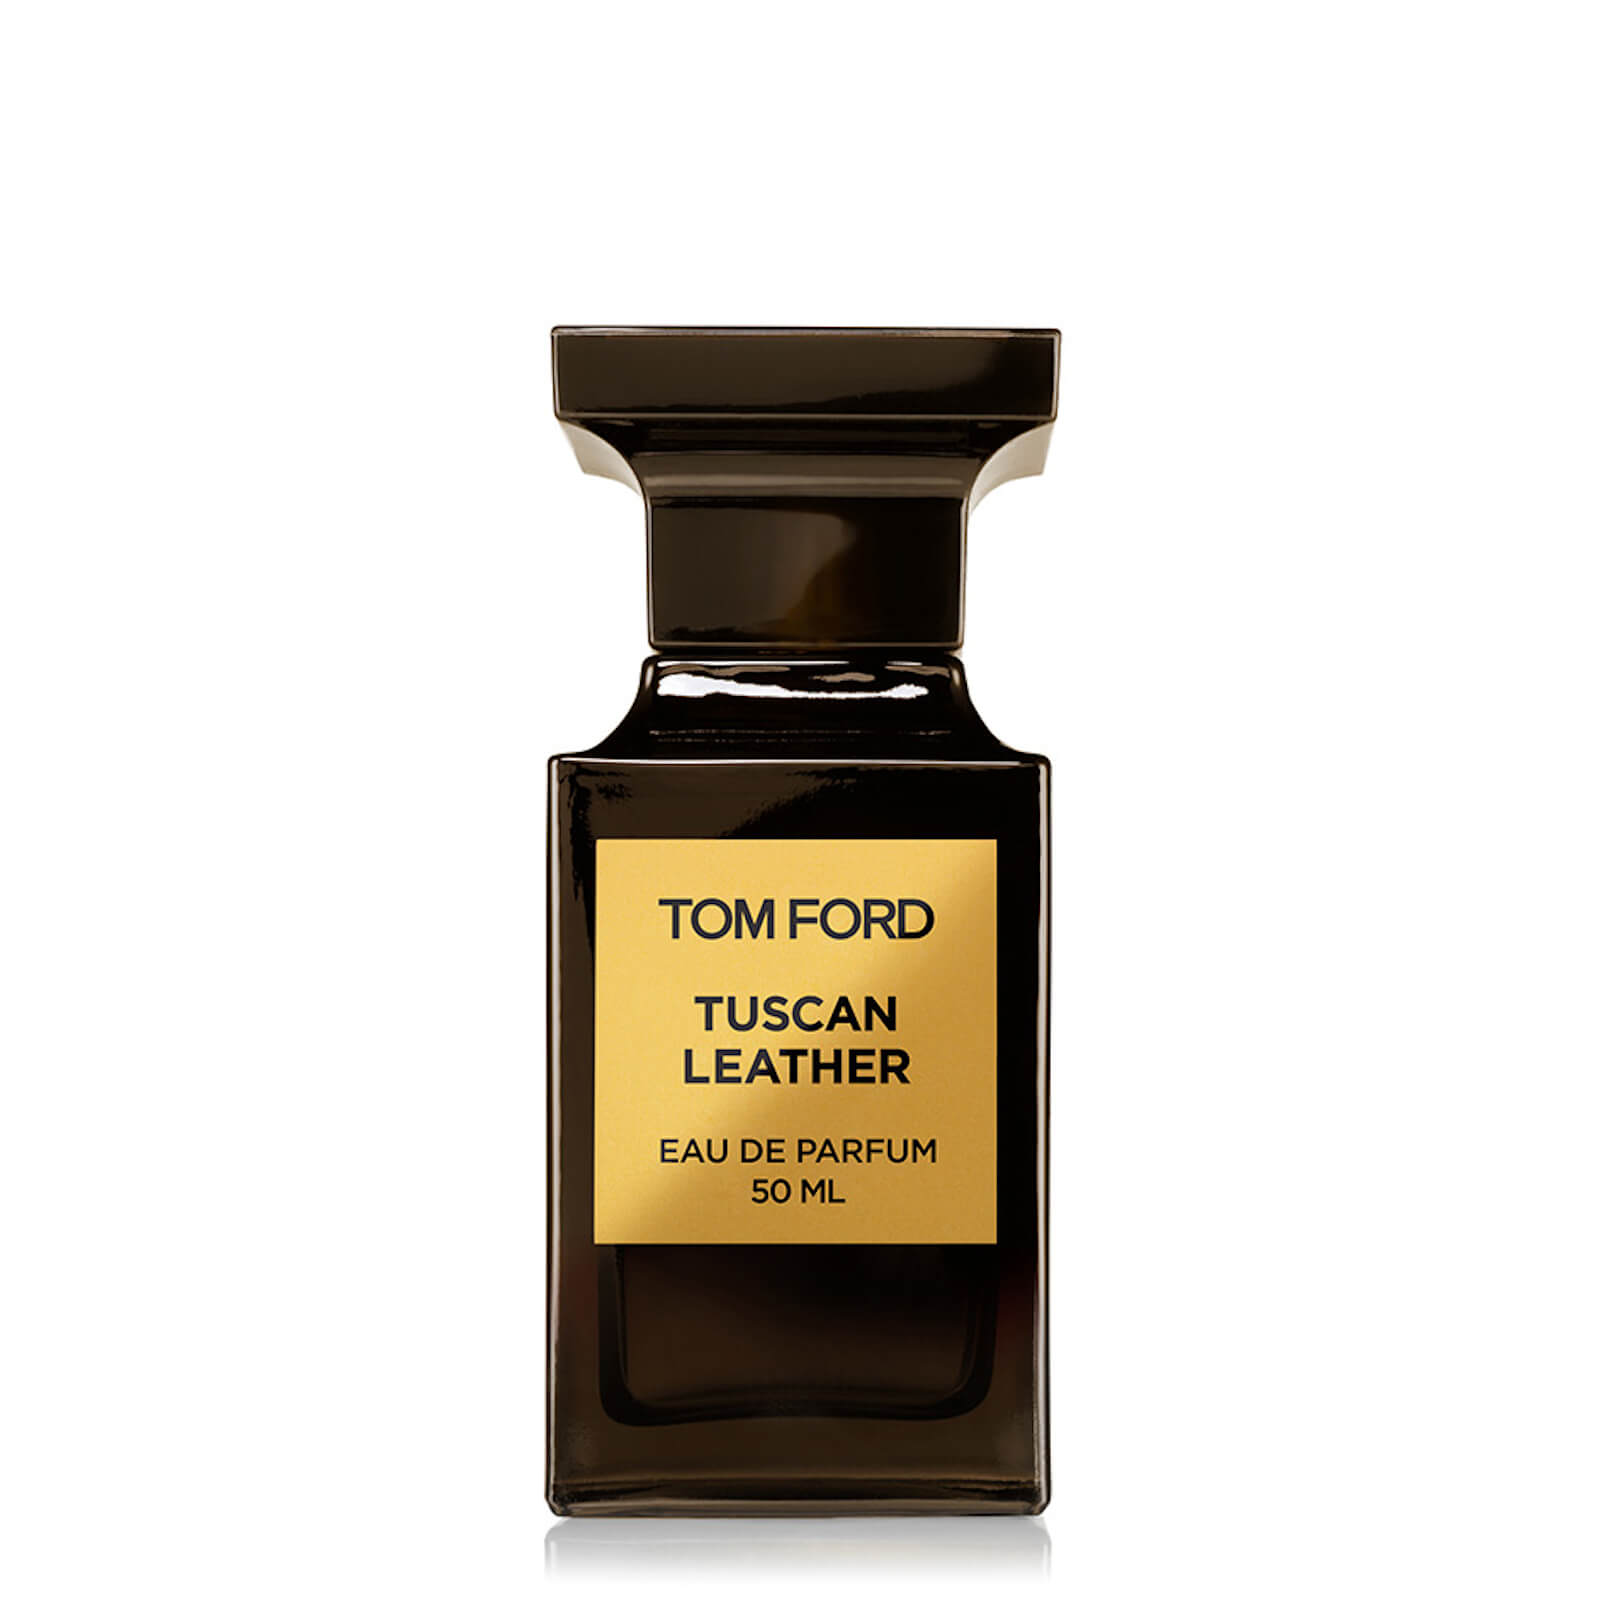 Tom Ford Tuscan Leather Eau de Parfum Spray (Various Sizes) - 50ML